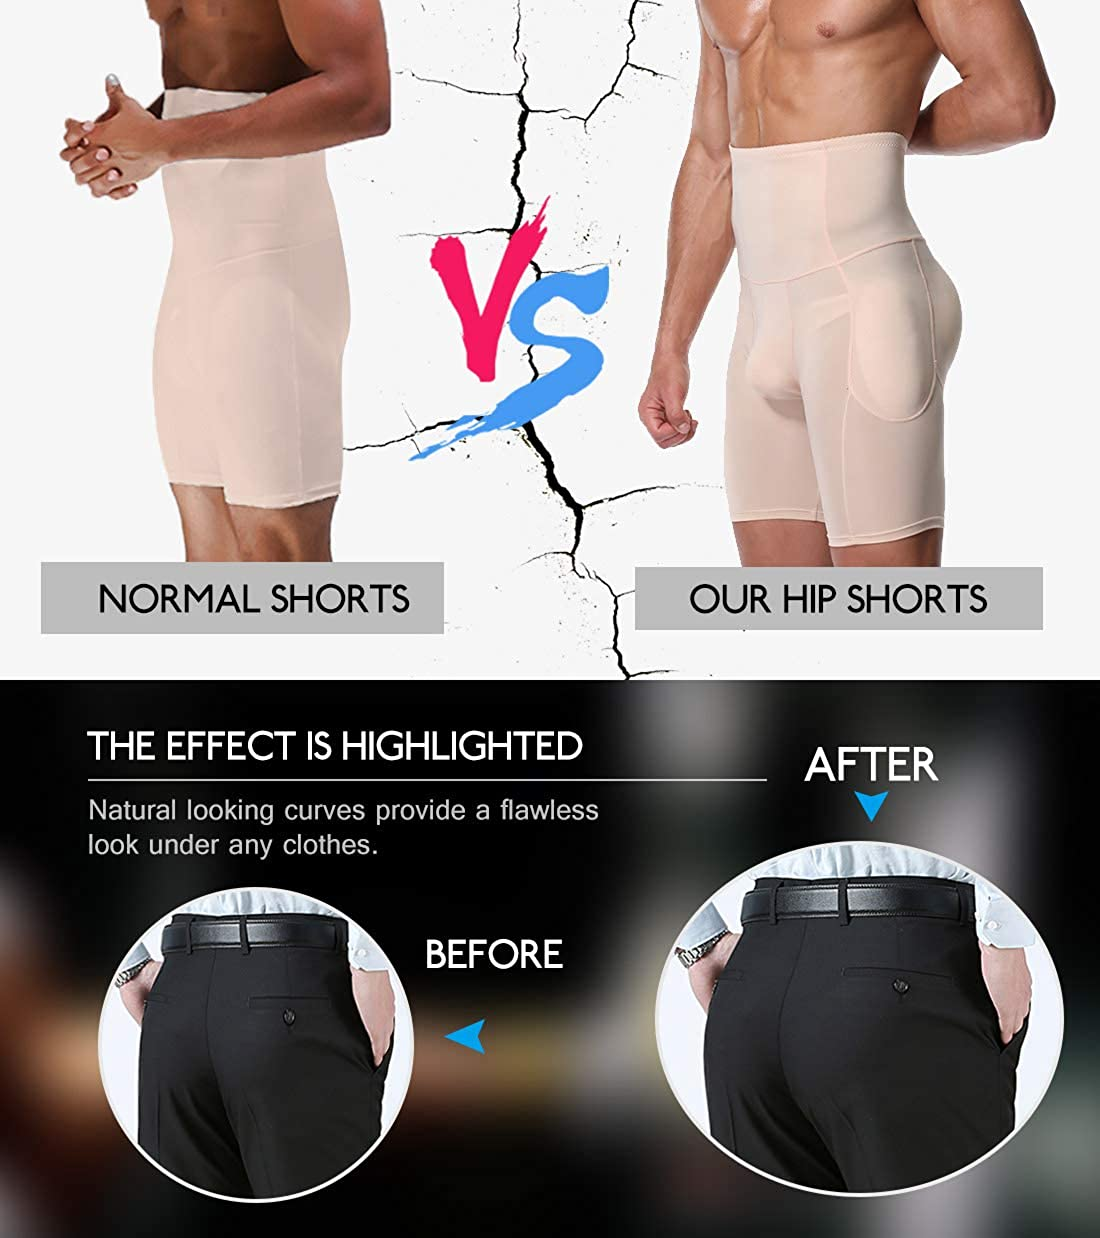 DoLoveY Men Butt Lifter Shapewear Butt Shaper Boxer Padded Enhancing Underwear Tummy Control